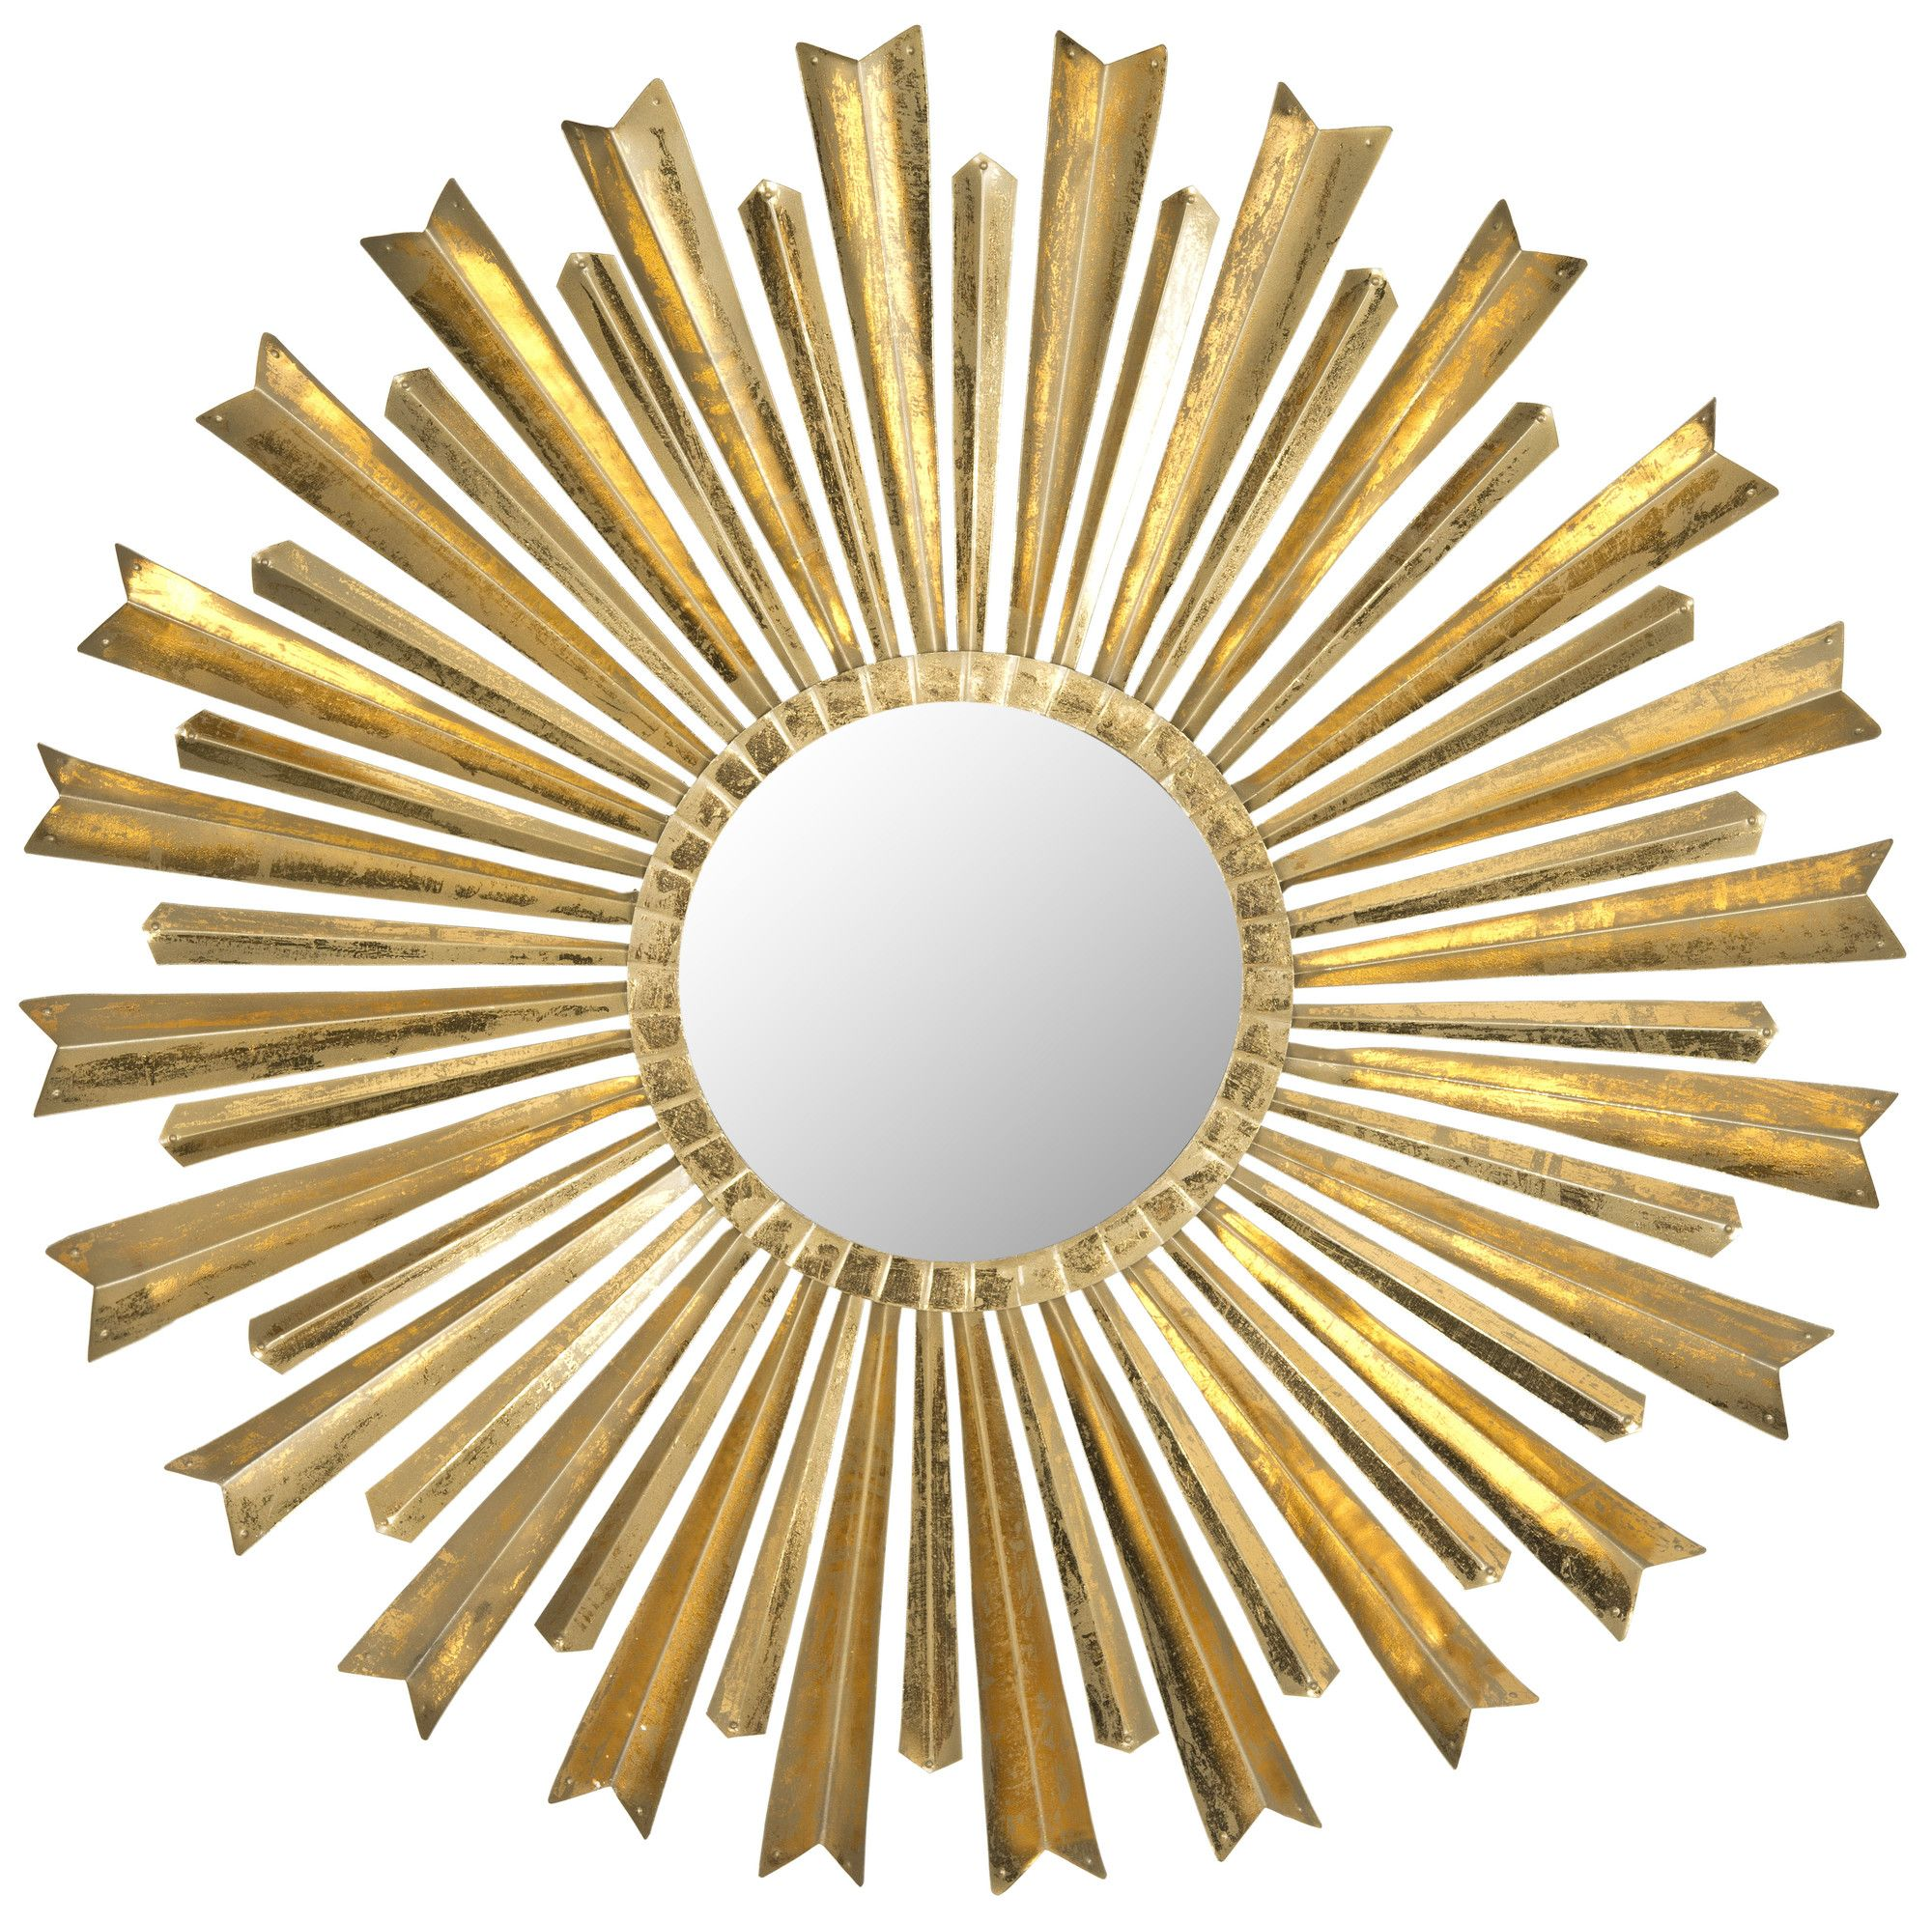 Safavieh Golden Arrows Sunburst Mirror & Reviews | Wayfair ...